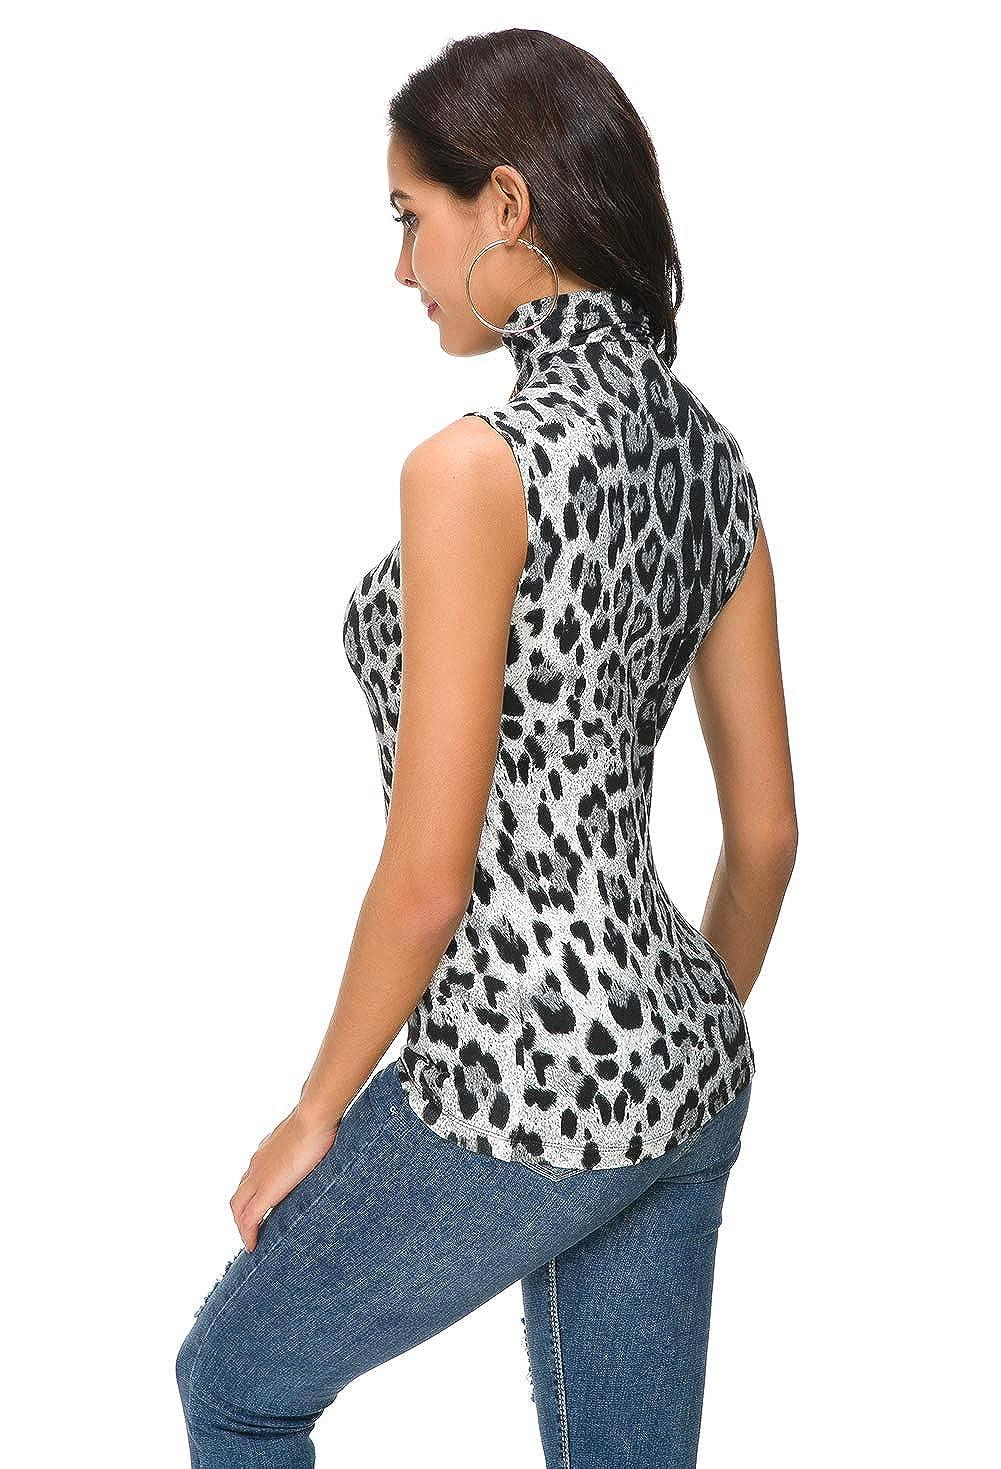 Nasperee Women Sleeveless High Turtleneck//Mock Neck Pullover Slim Fit T Shirt Tank Top